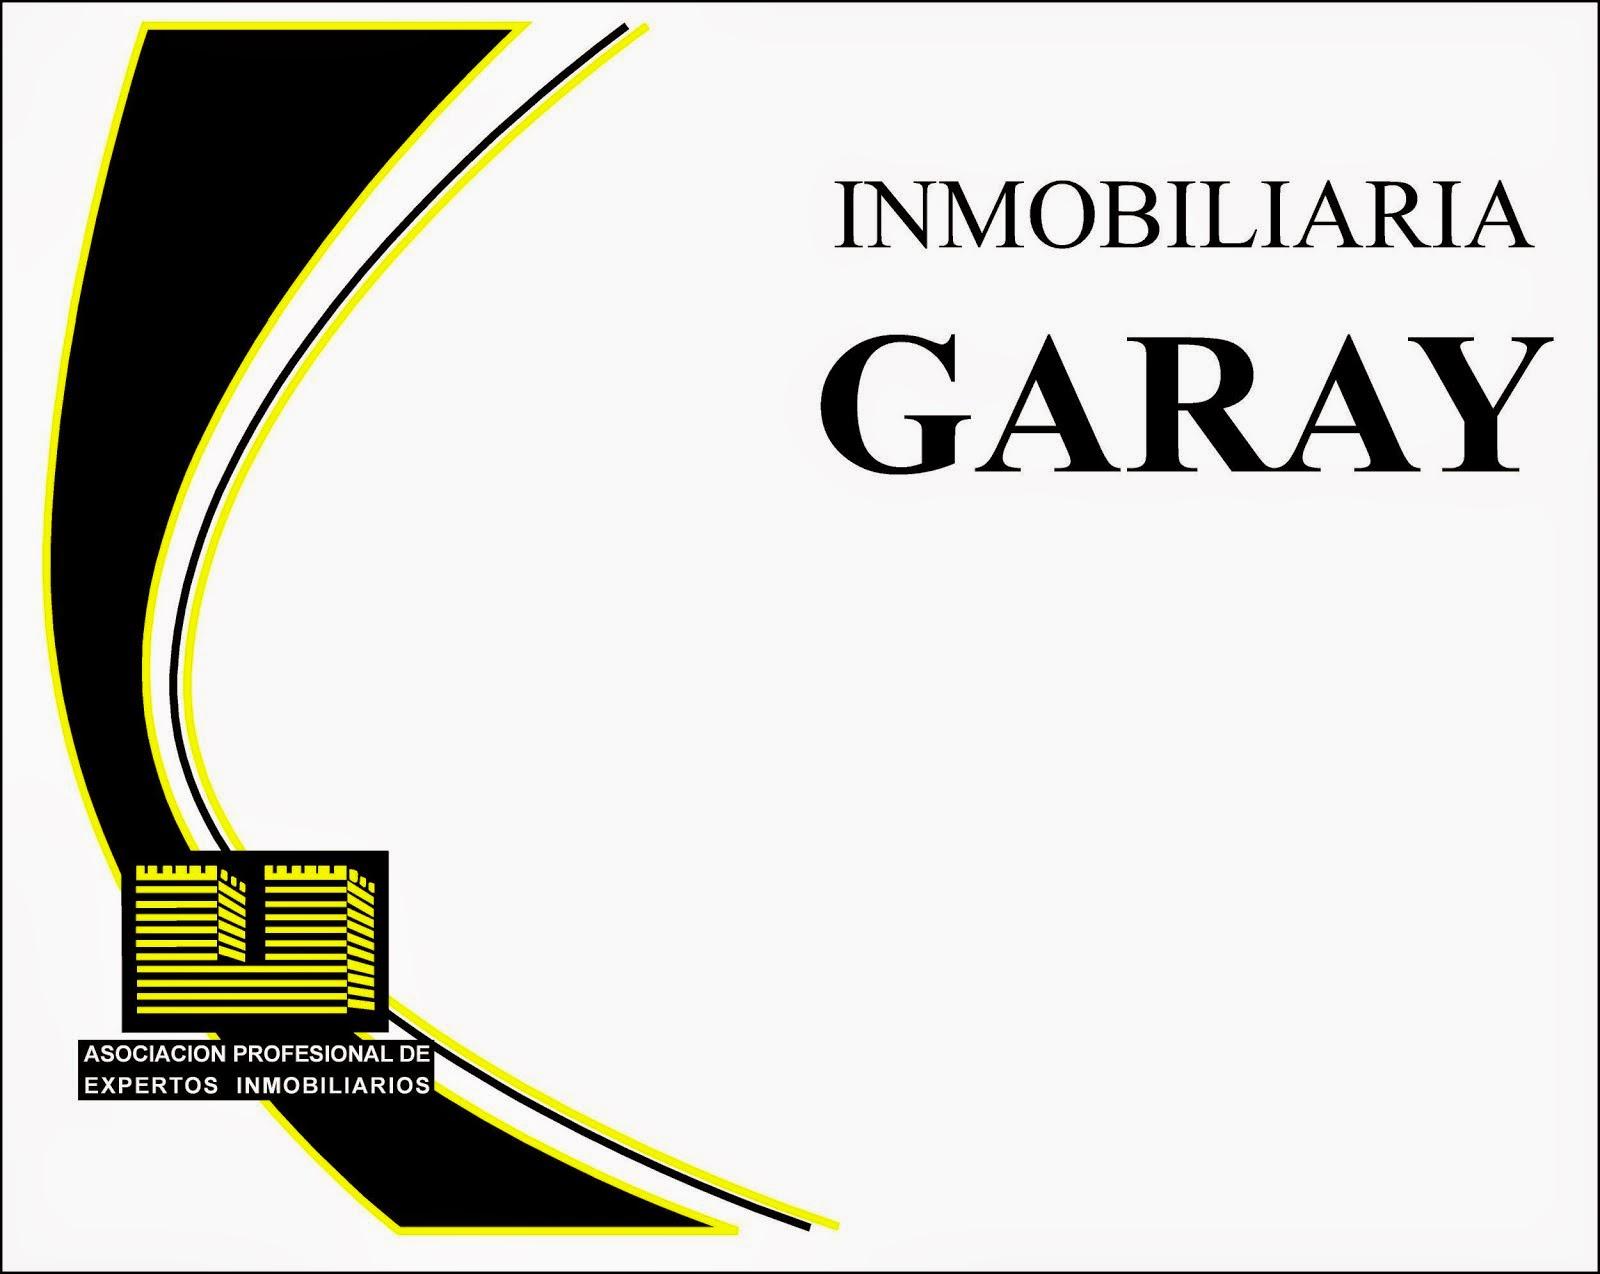 Inmobiliaria Garay